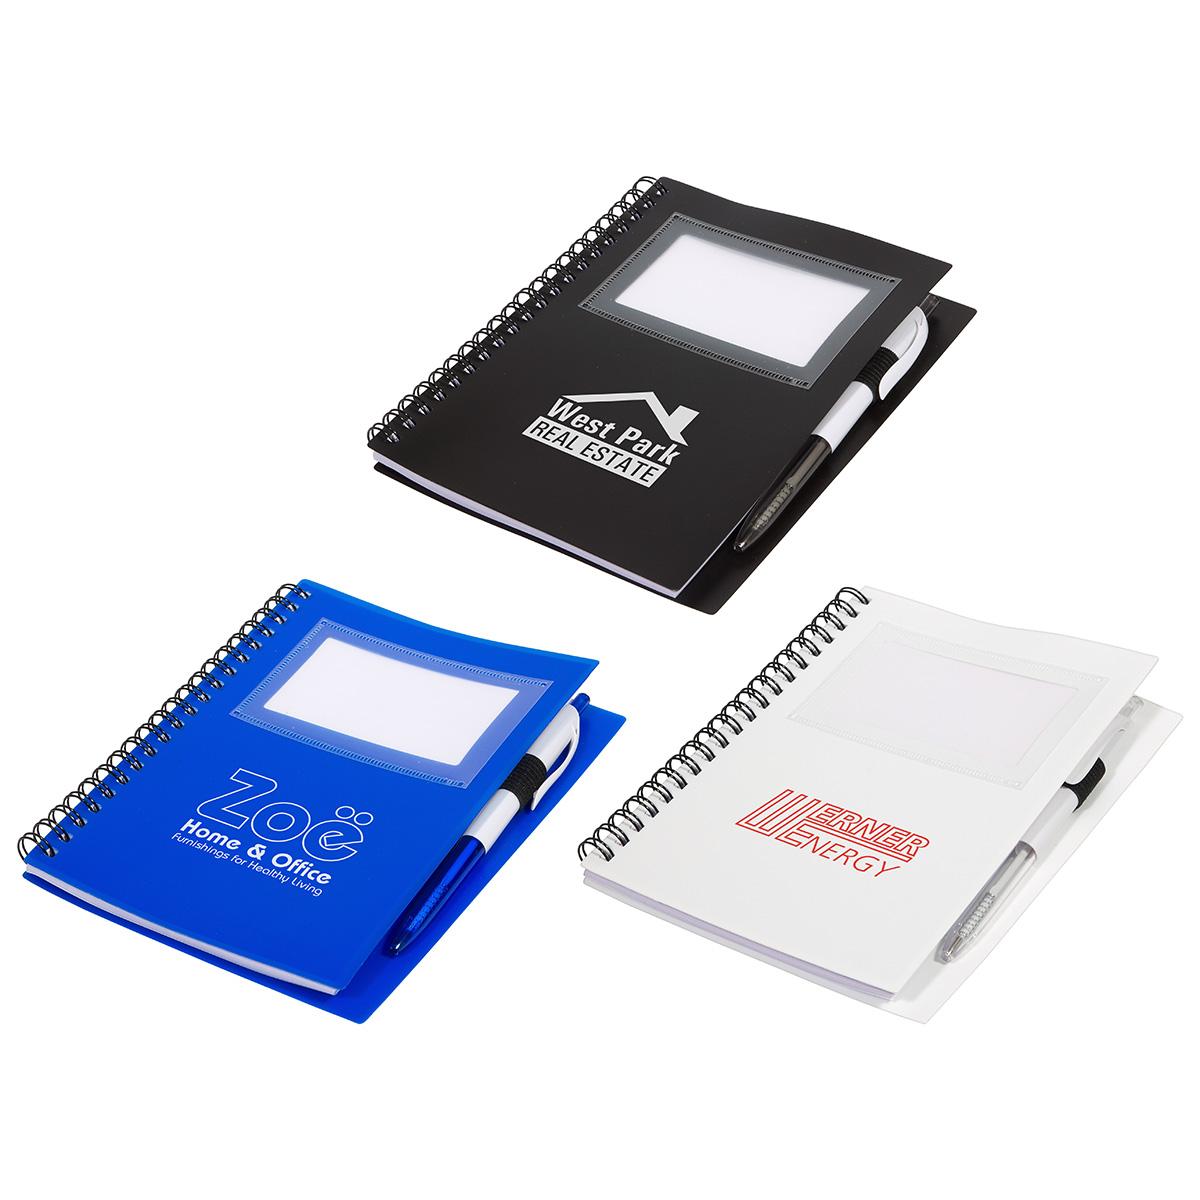 Note-It Memo Book, WOF-MB15, 1 Colour Imprint